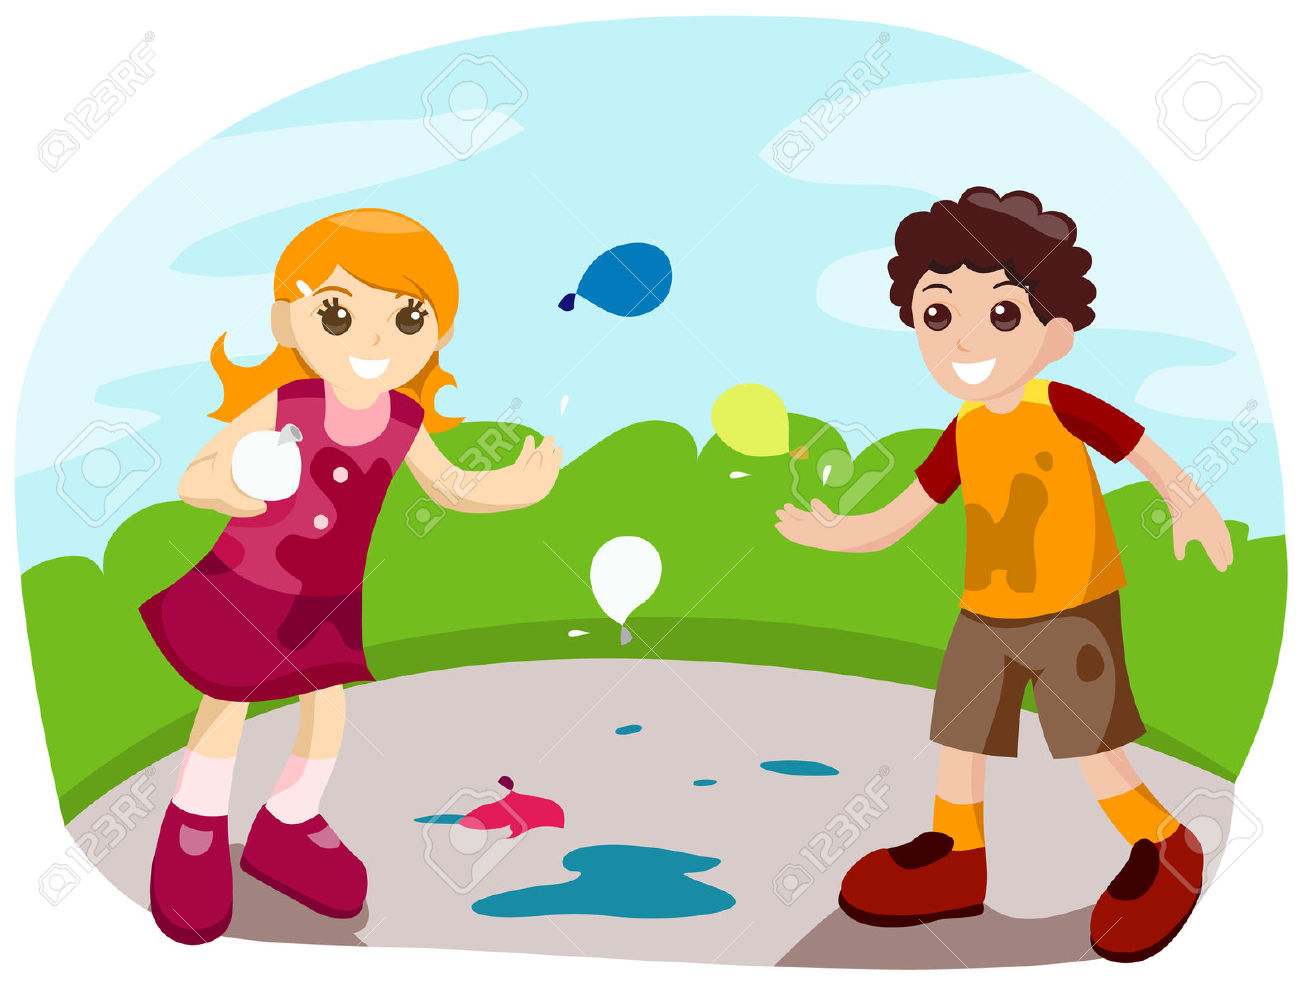 Water Balloon Clipart.